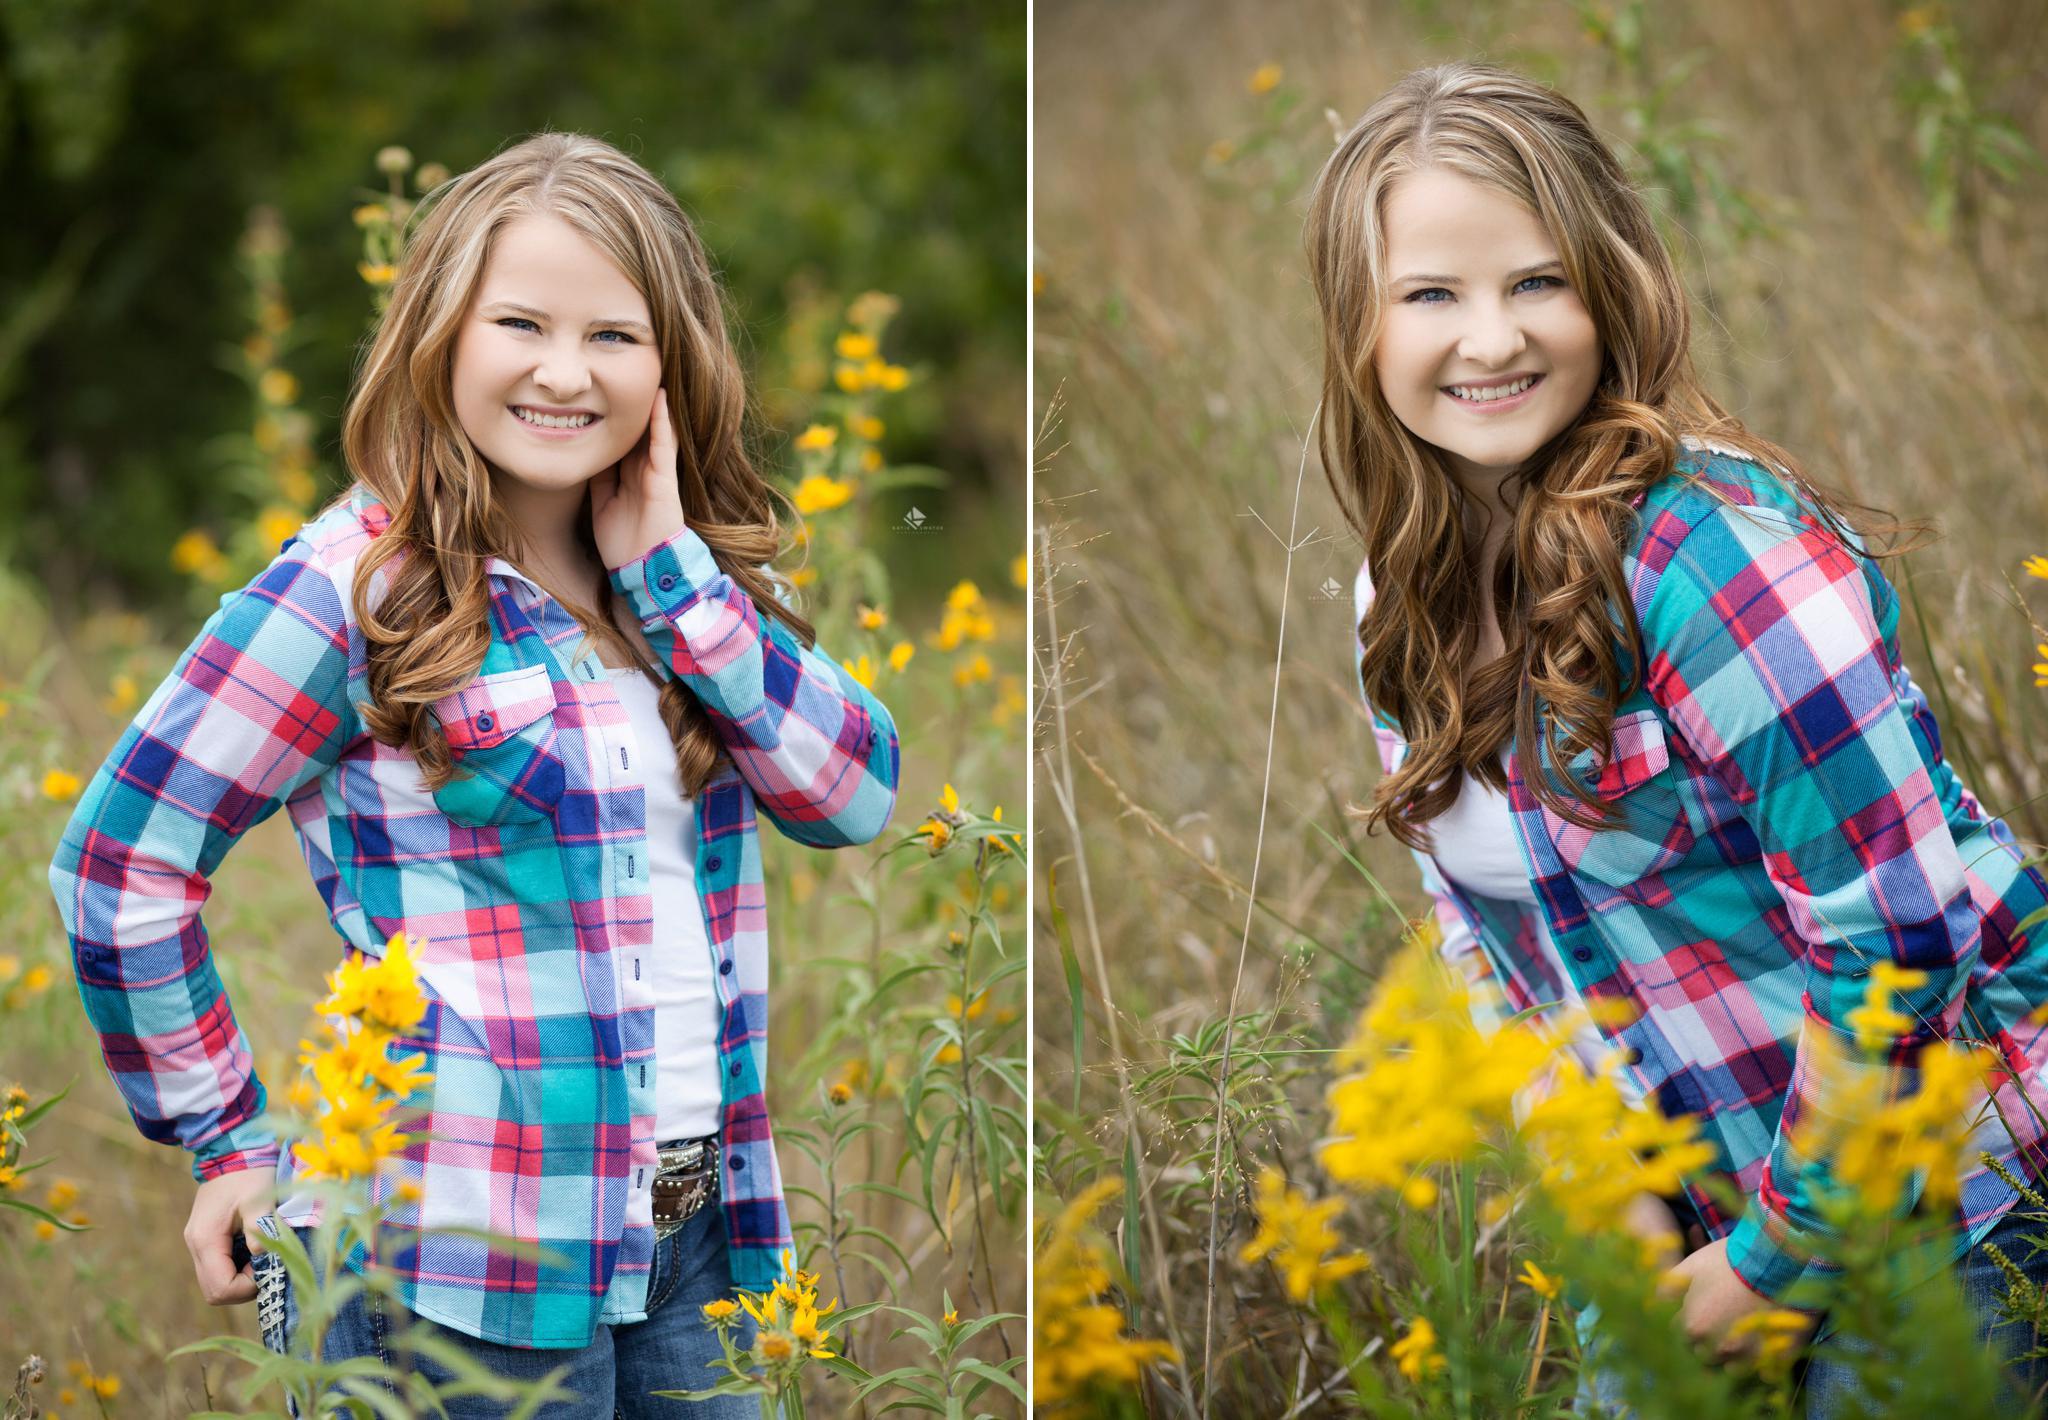 South Dakota Senior Pictures | Country Senior Pictures by Katie Swatek Photography | Fall Senior Pictures by Katie Swatek Photography